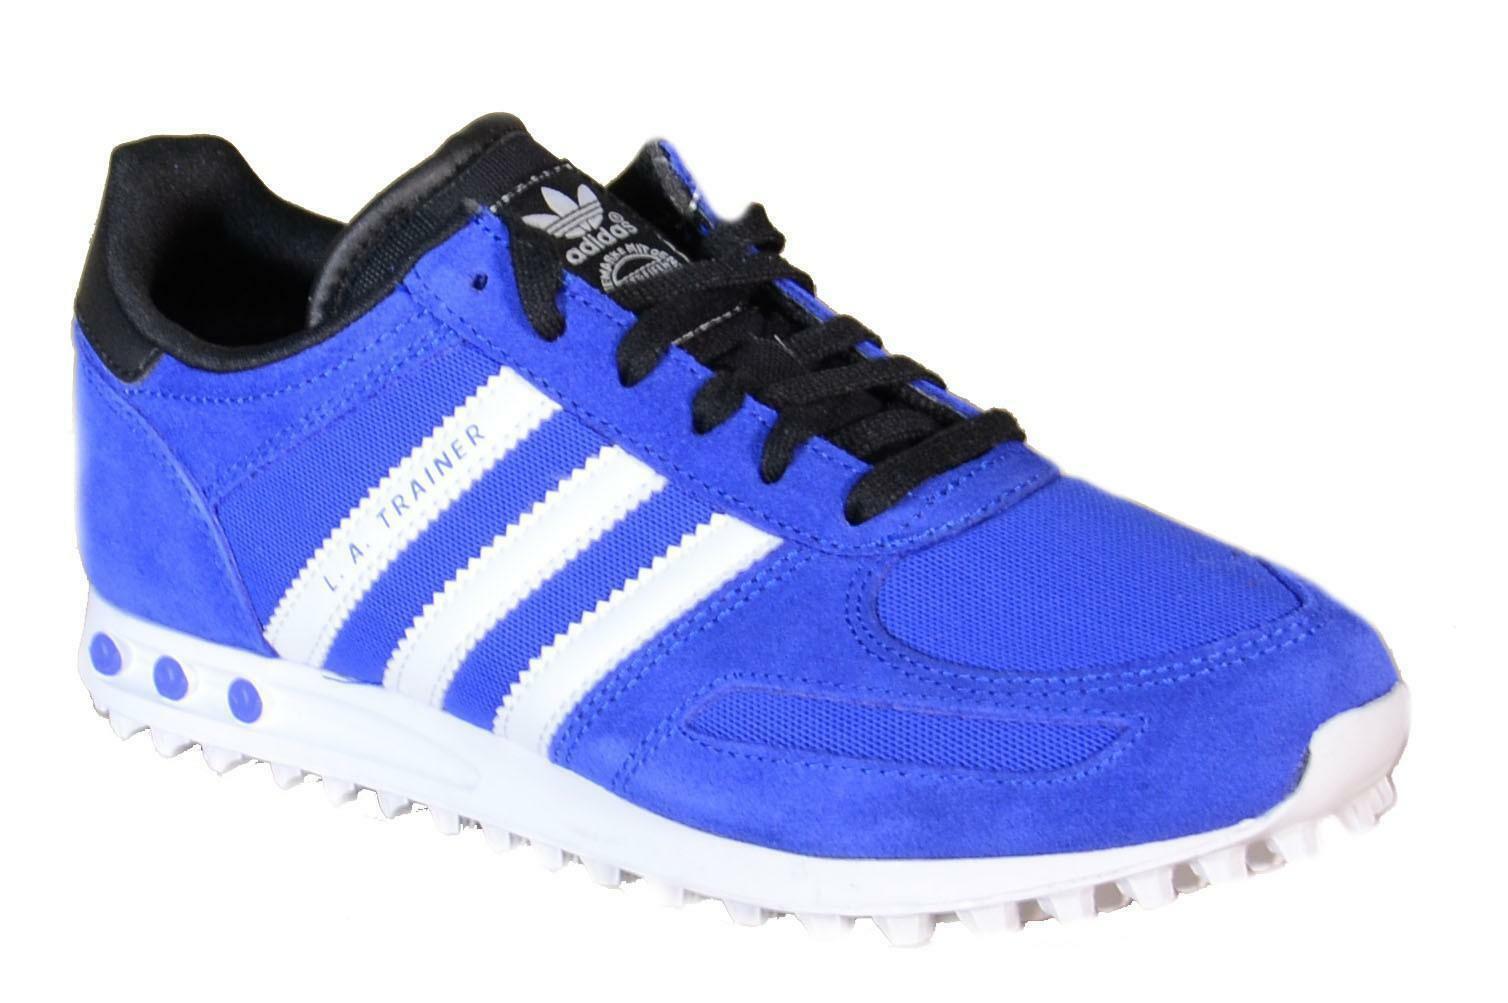 Adidas la trainer k scarpe sportive donna blu pelle tela b25694